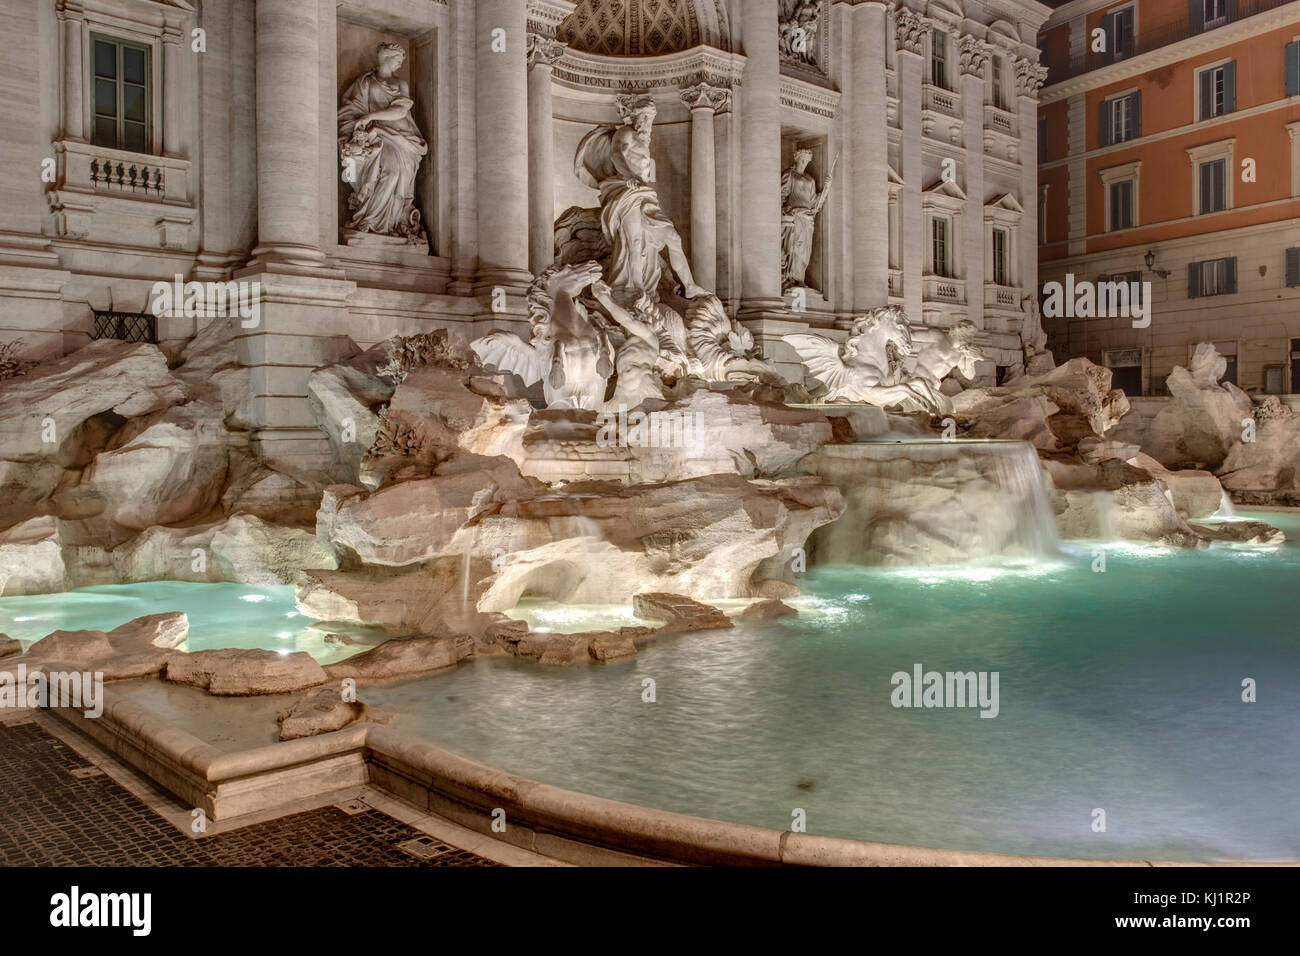 Tevi Fountain Rome - Fontana di Trevi, Rome Stock Photo